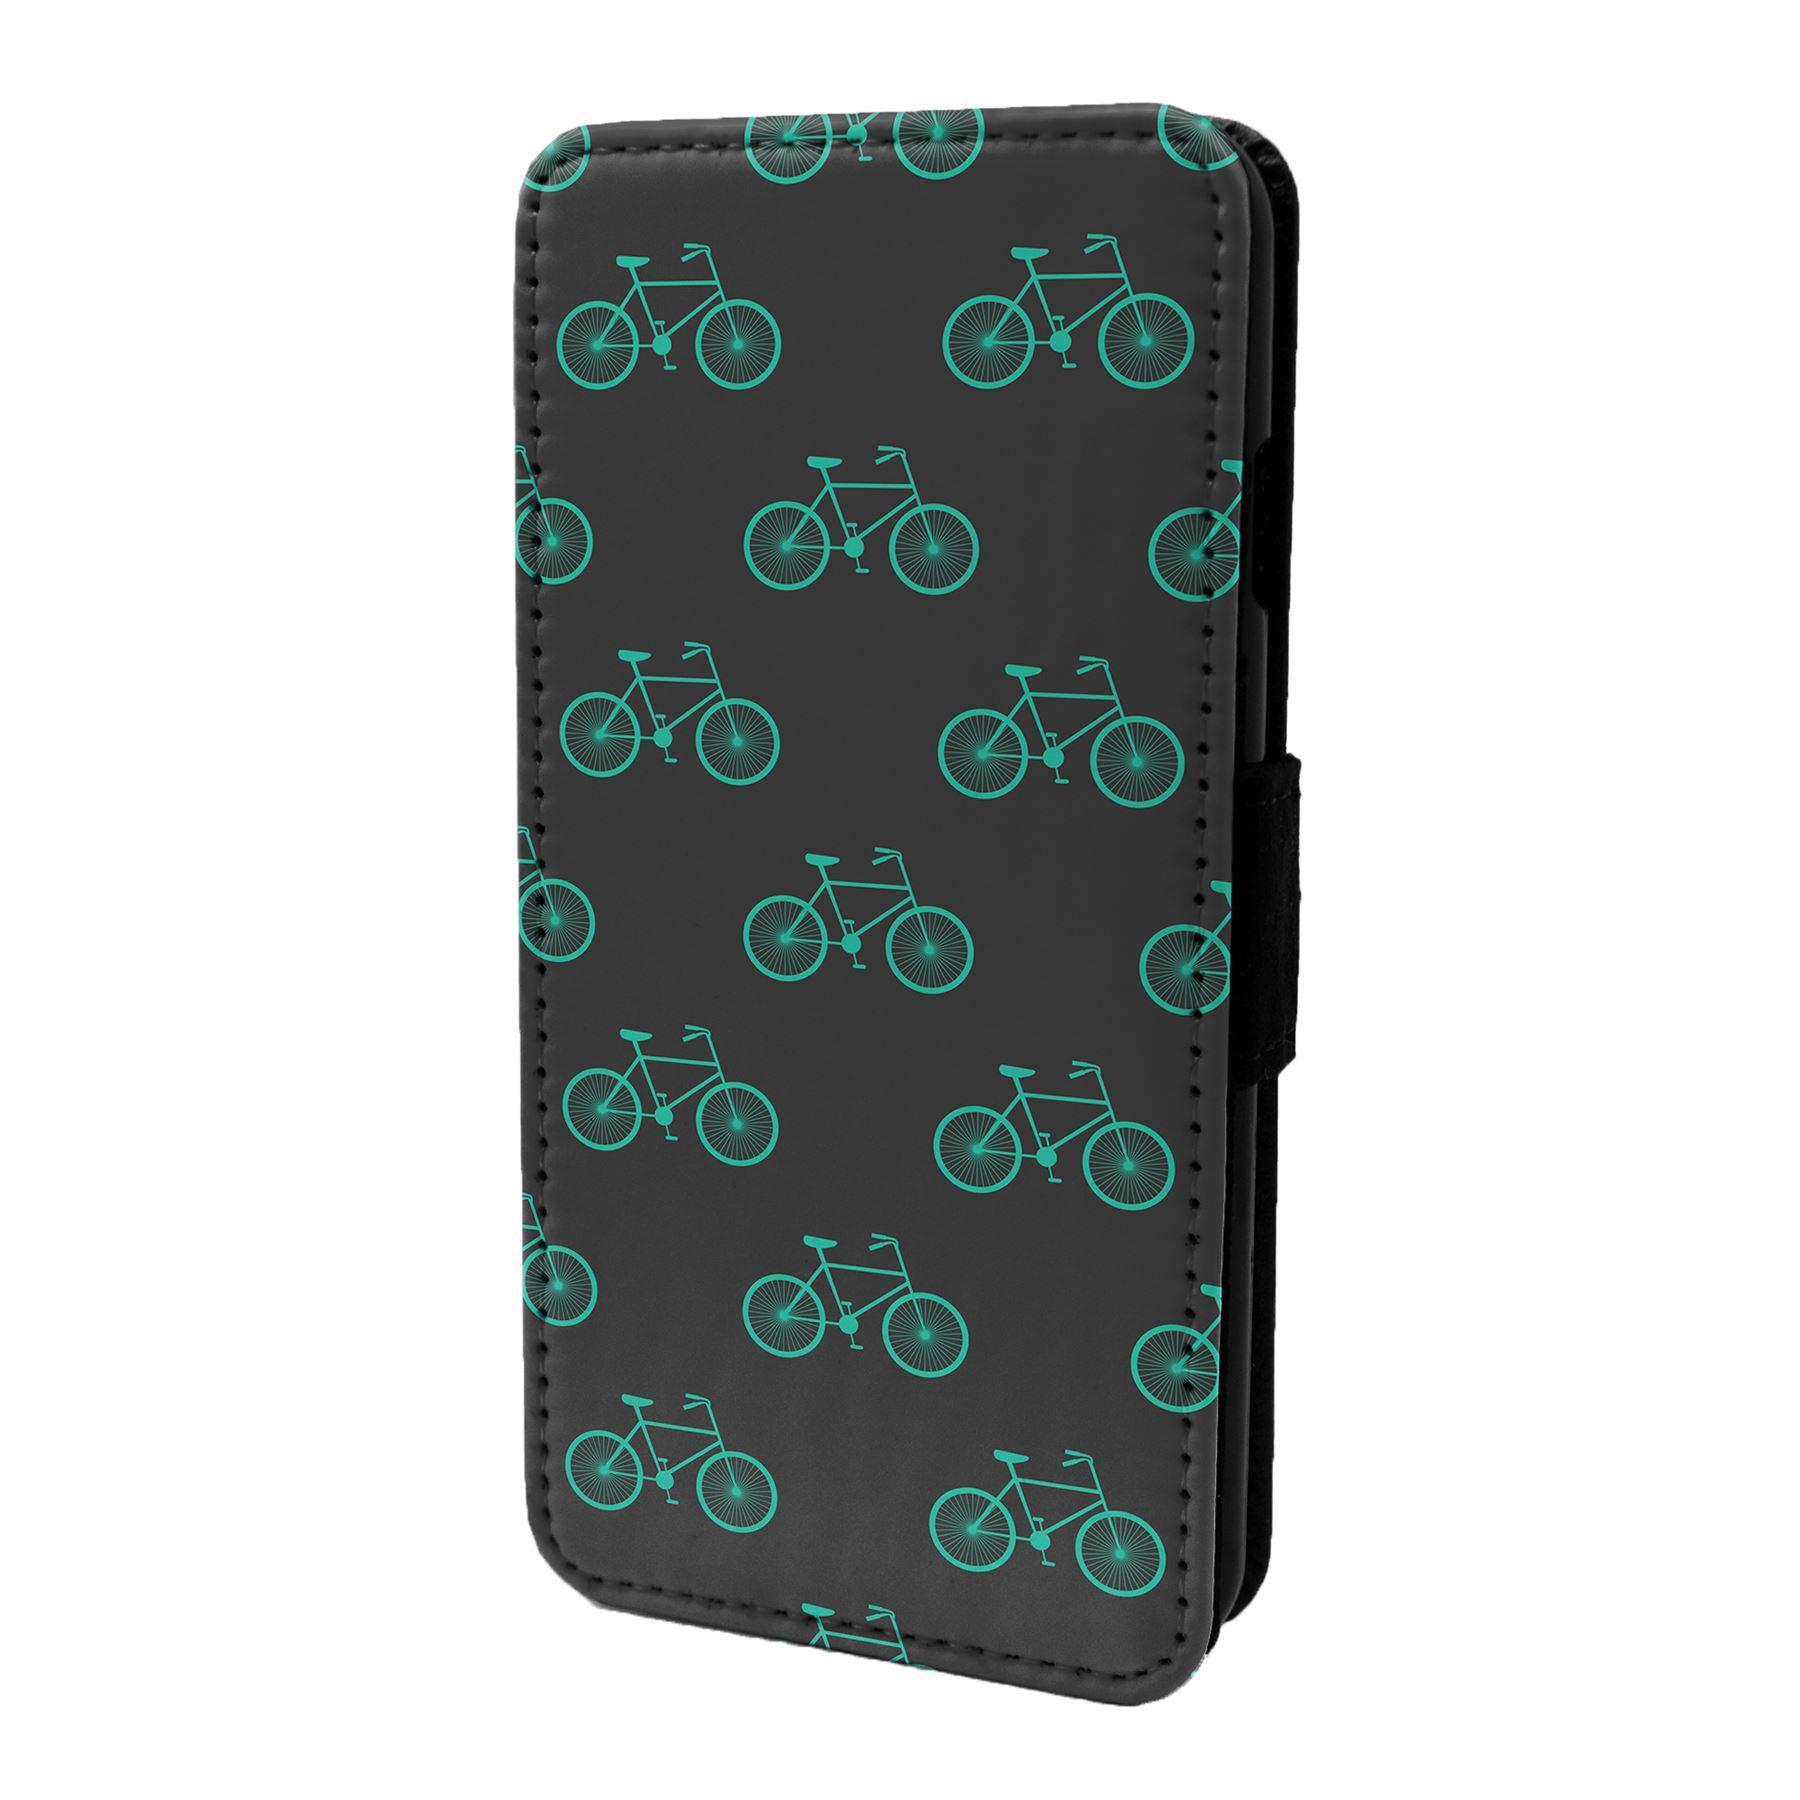 Velo-Cyclisme-Motif-Etui-Rabattable-pour-Telephone-Portable-S6636